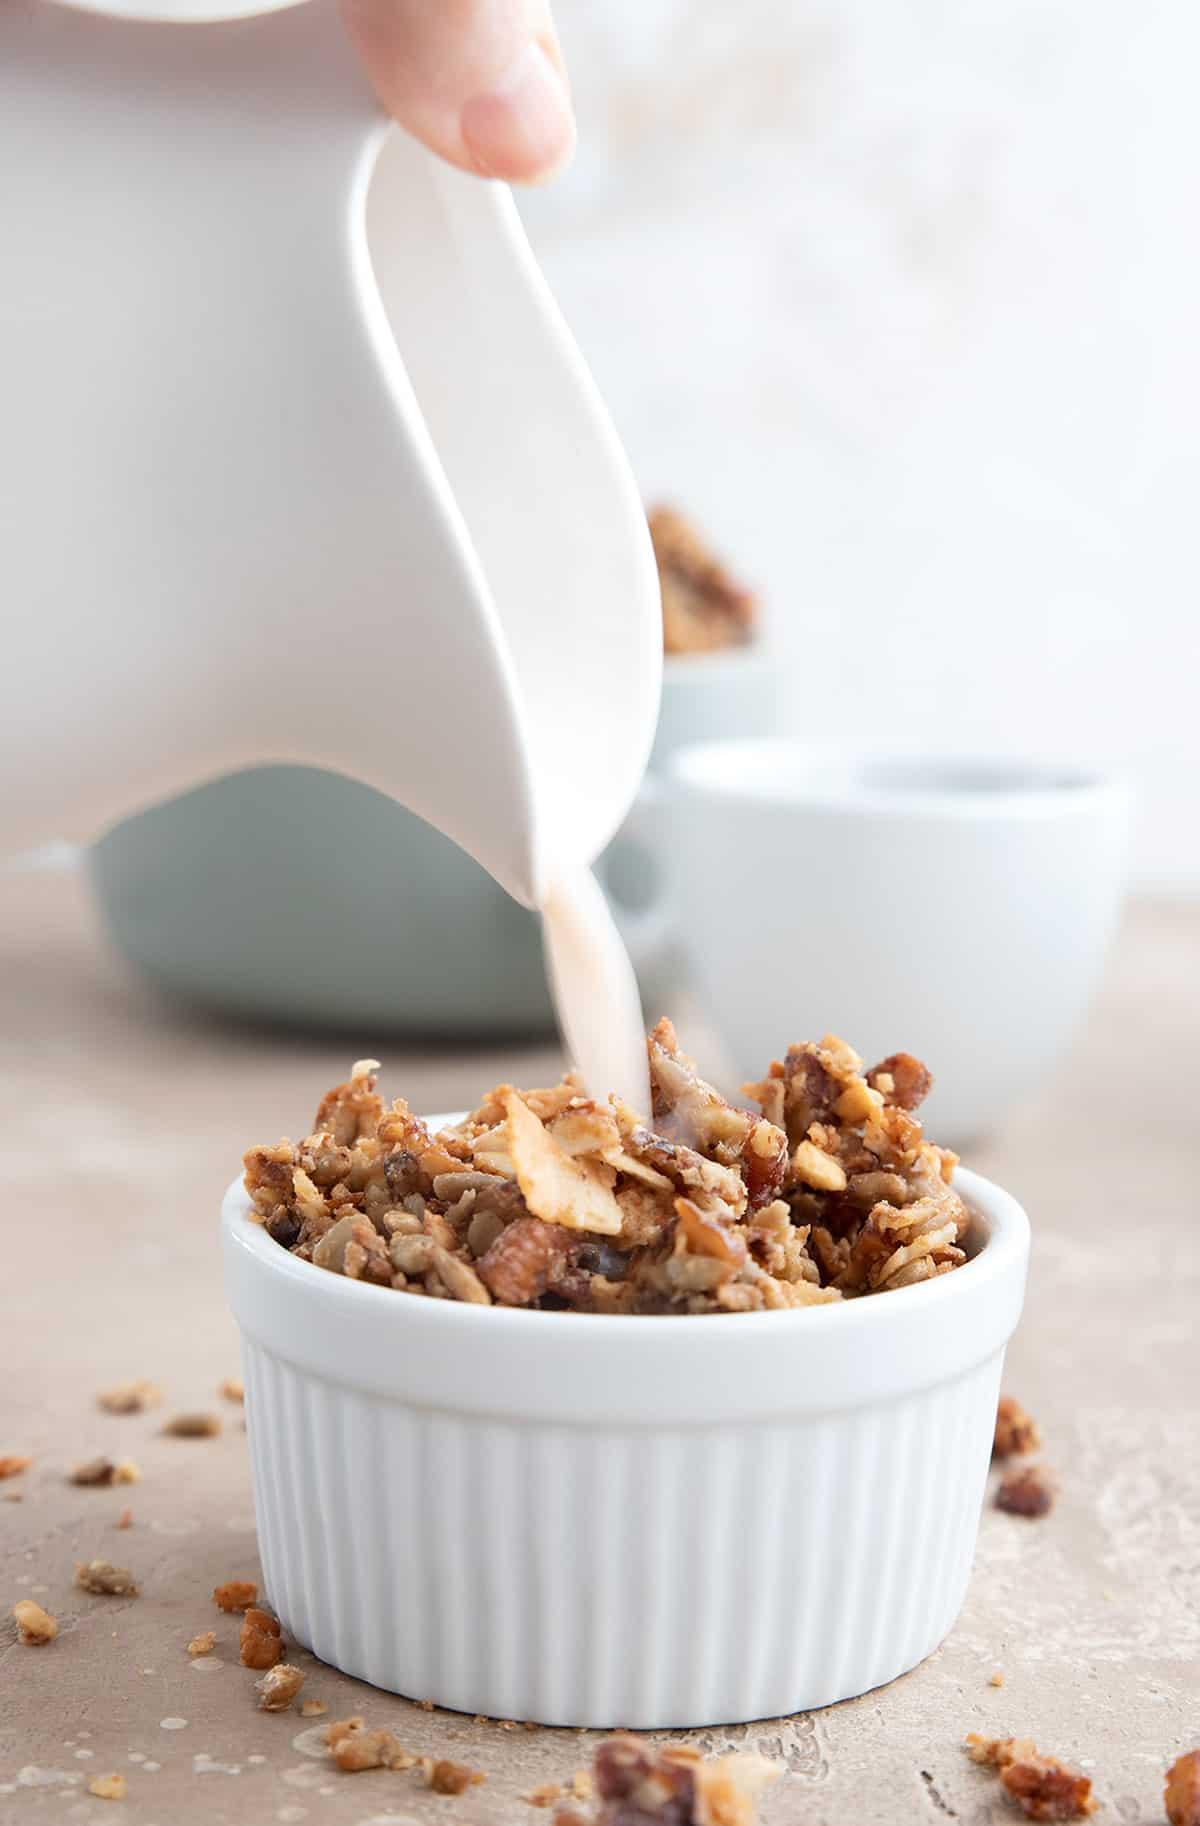 A white jug pours almond milk into a bowl of low carb granola